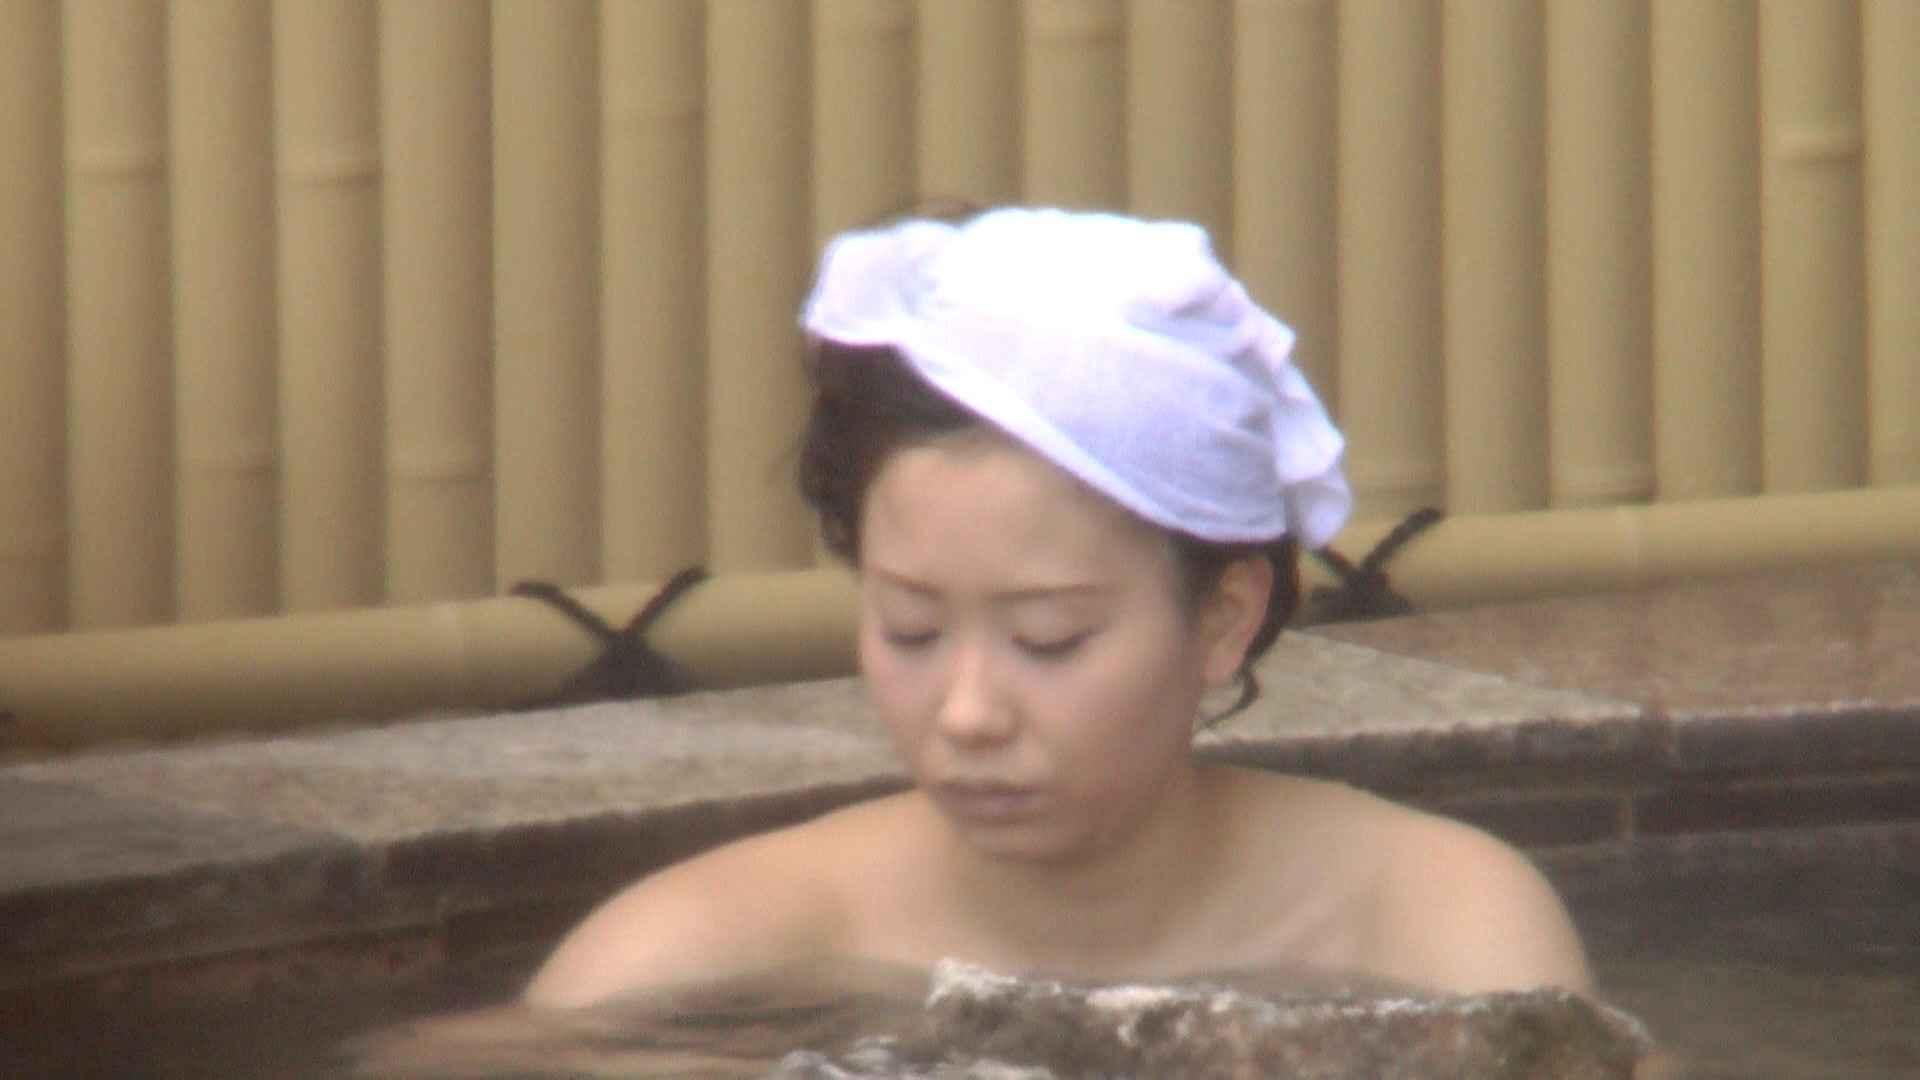 Aquaな露天風呂Vol.211 HなOL   盗撮  76pic 5